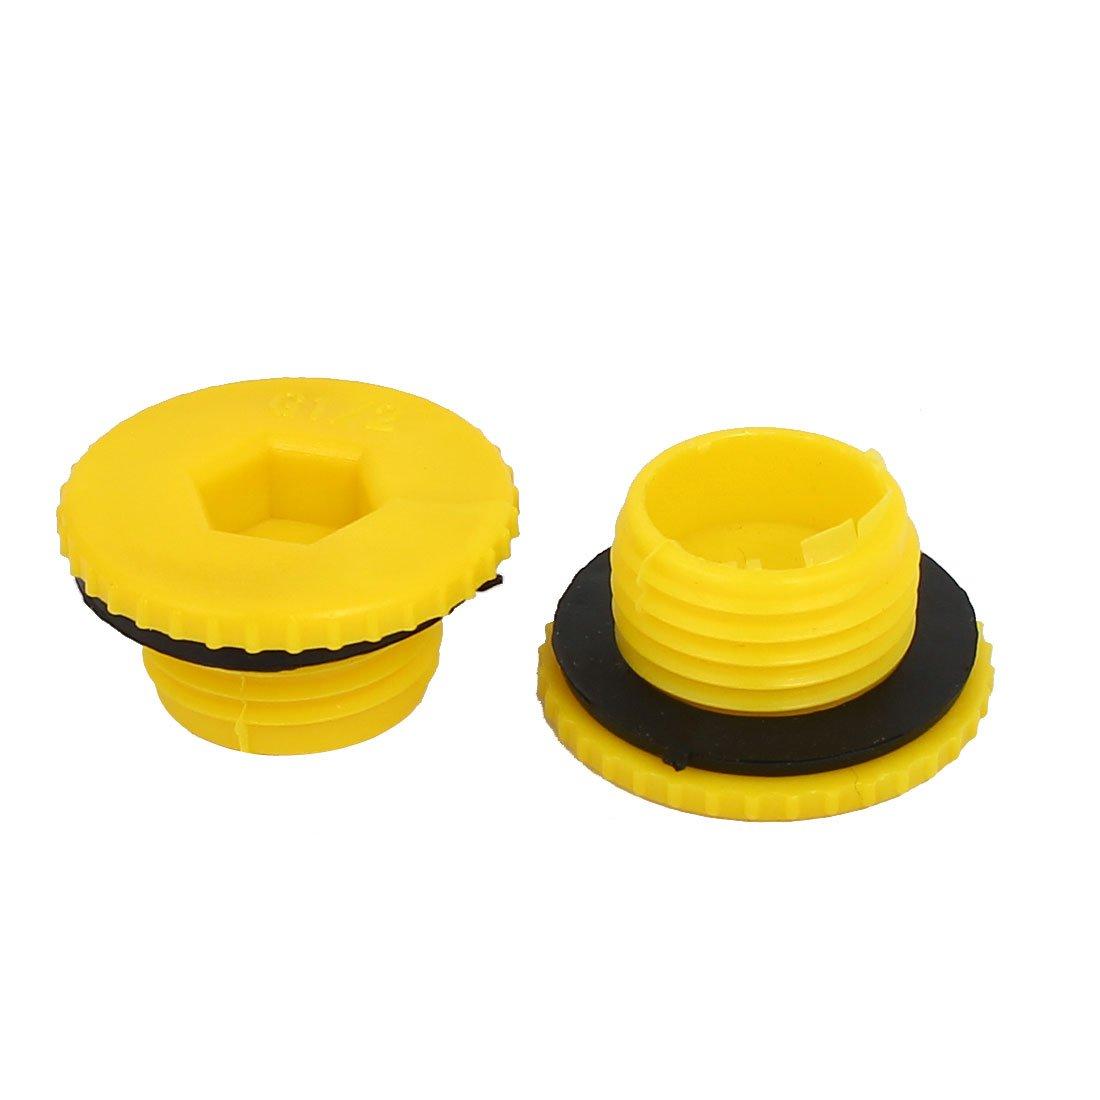 uxcellG1//2 Hex Socket Design Plastic Male Threaded Sealing Cap Yellow 5pcs